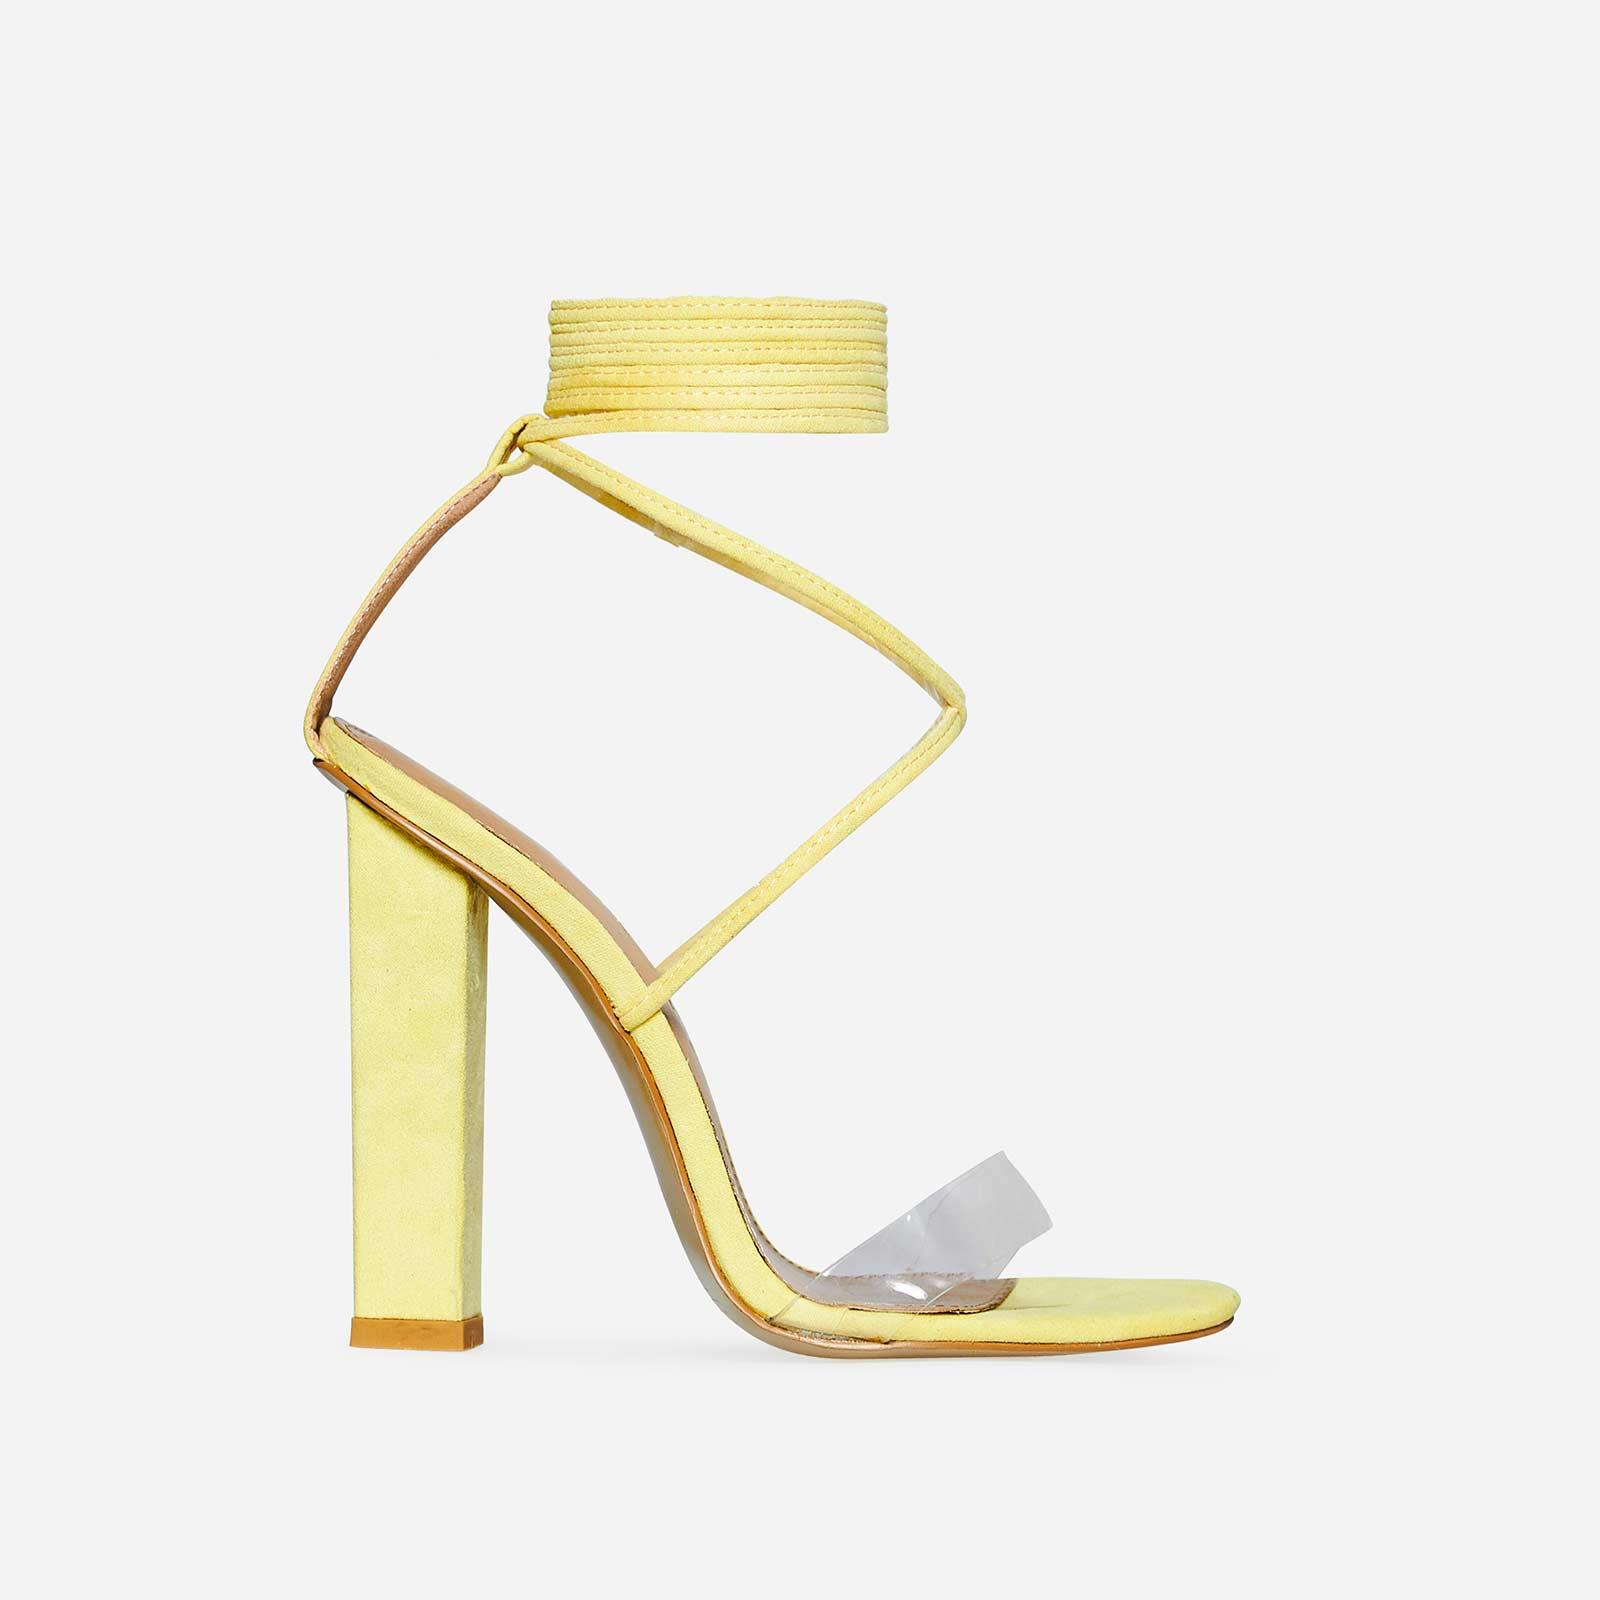 Bello Perspex Lace Up Block Heel In Lemon Yellow Faux Suede